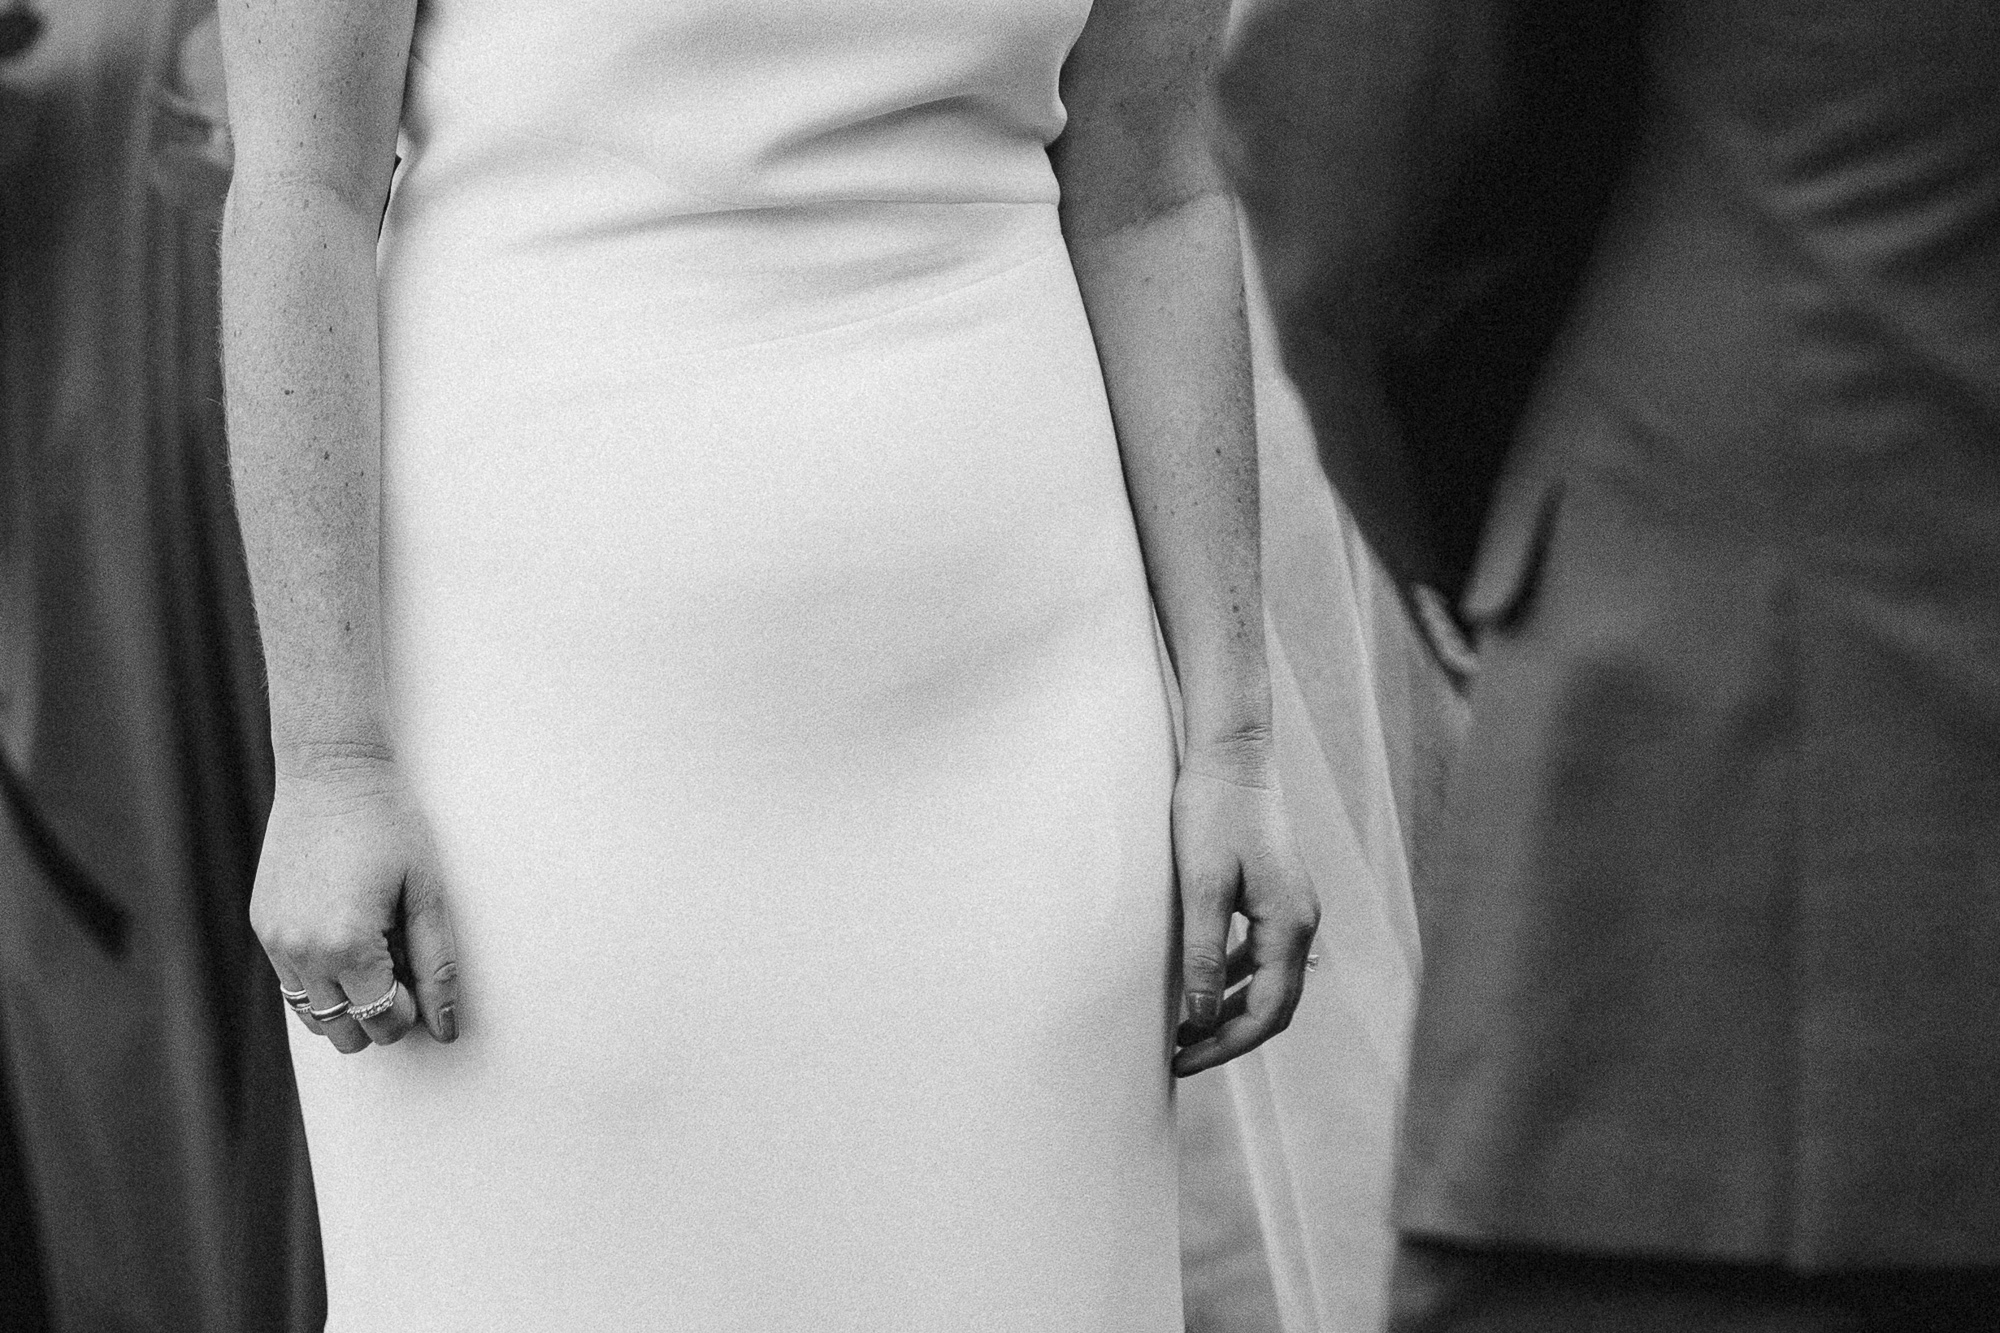 Bride at Ceremony.